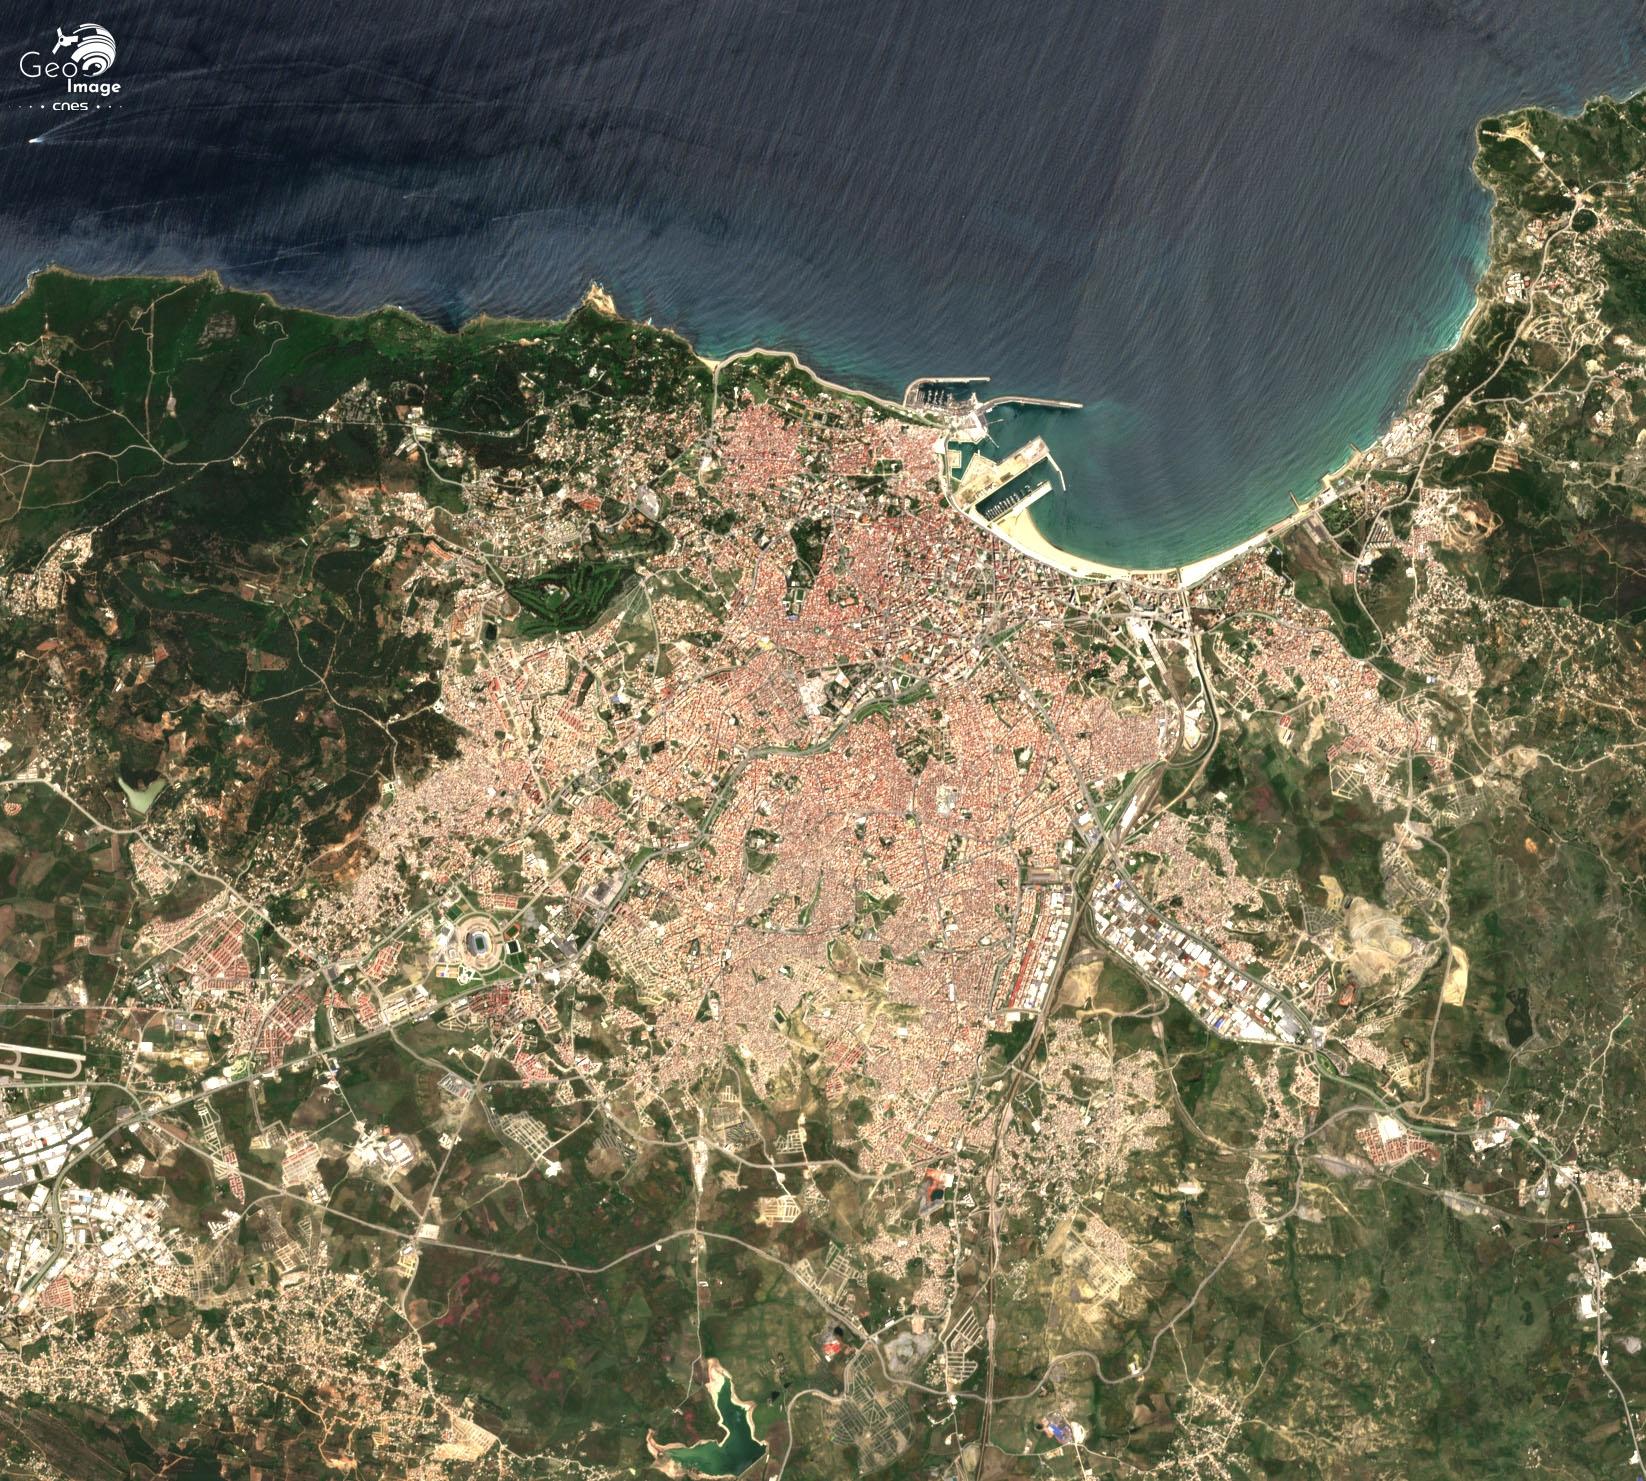 Maroc - Tanger : le Maroc retrouve le Nord